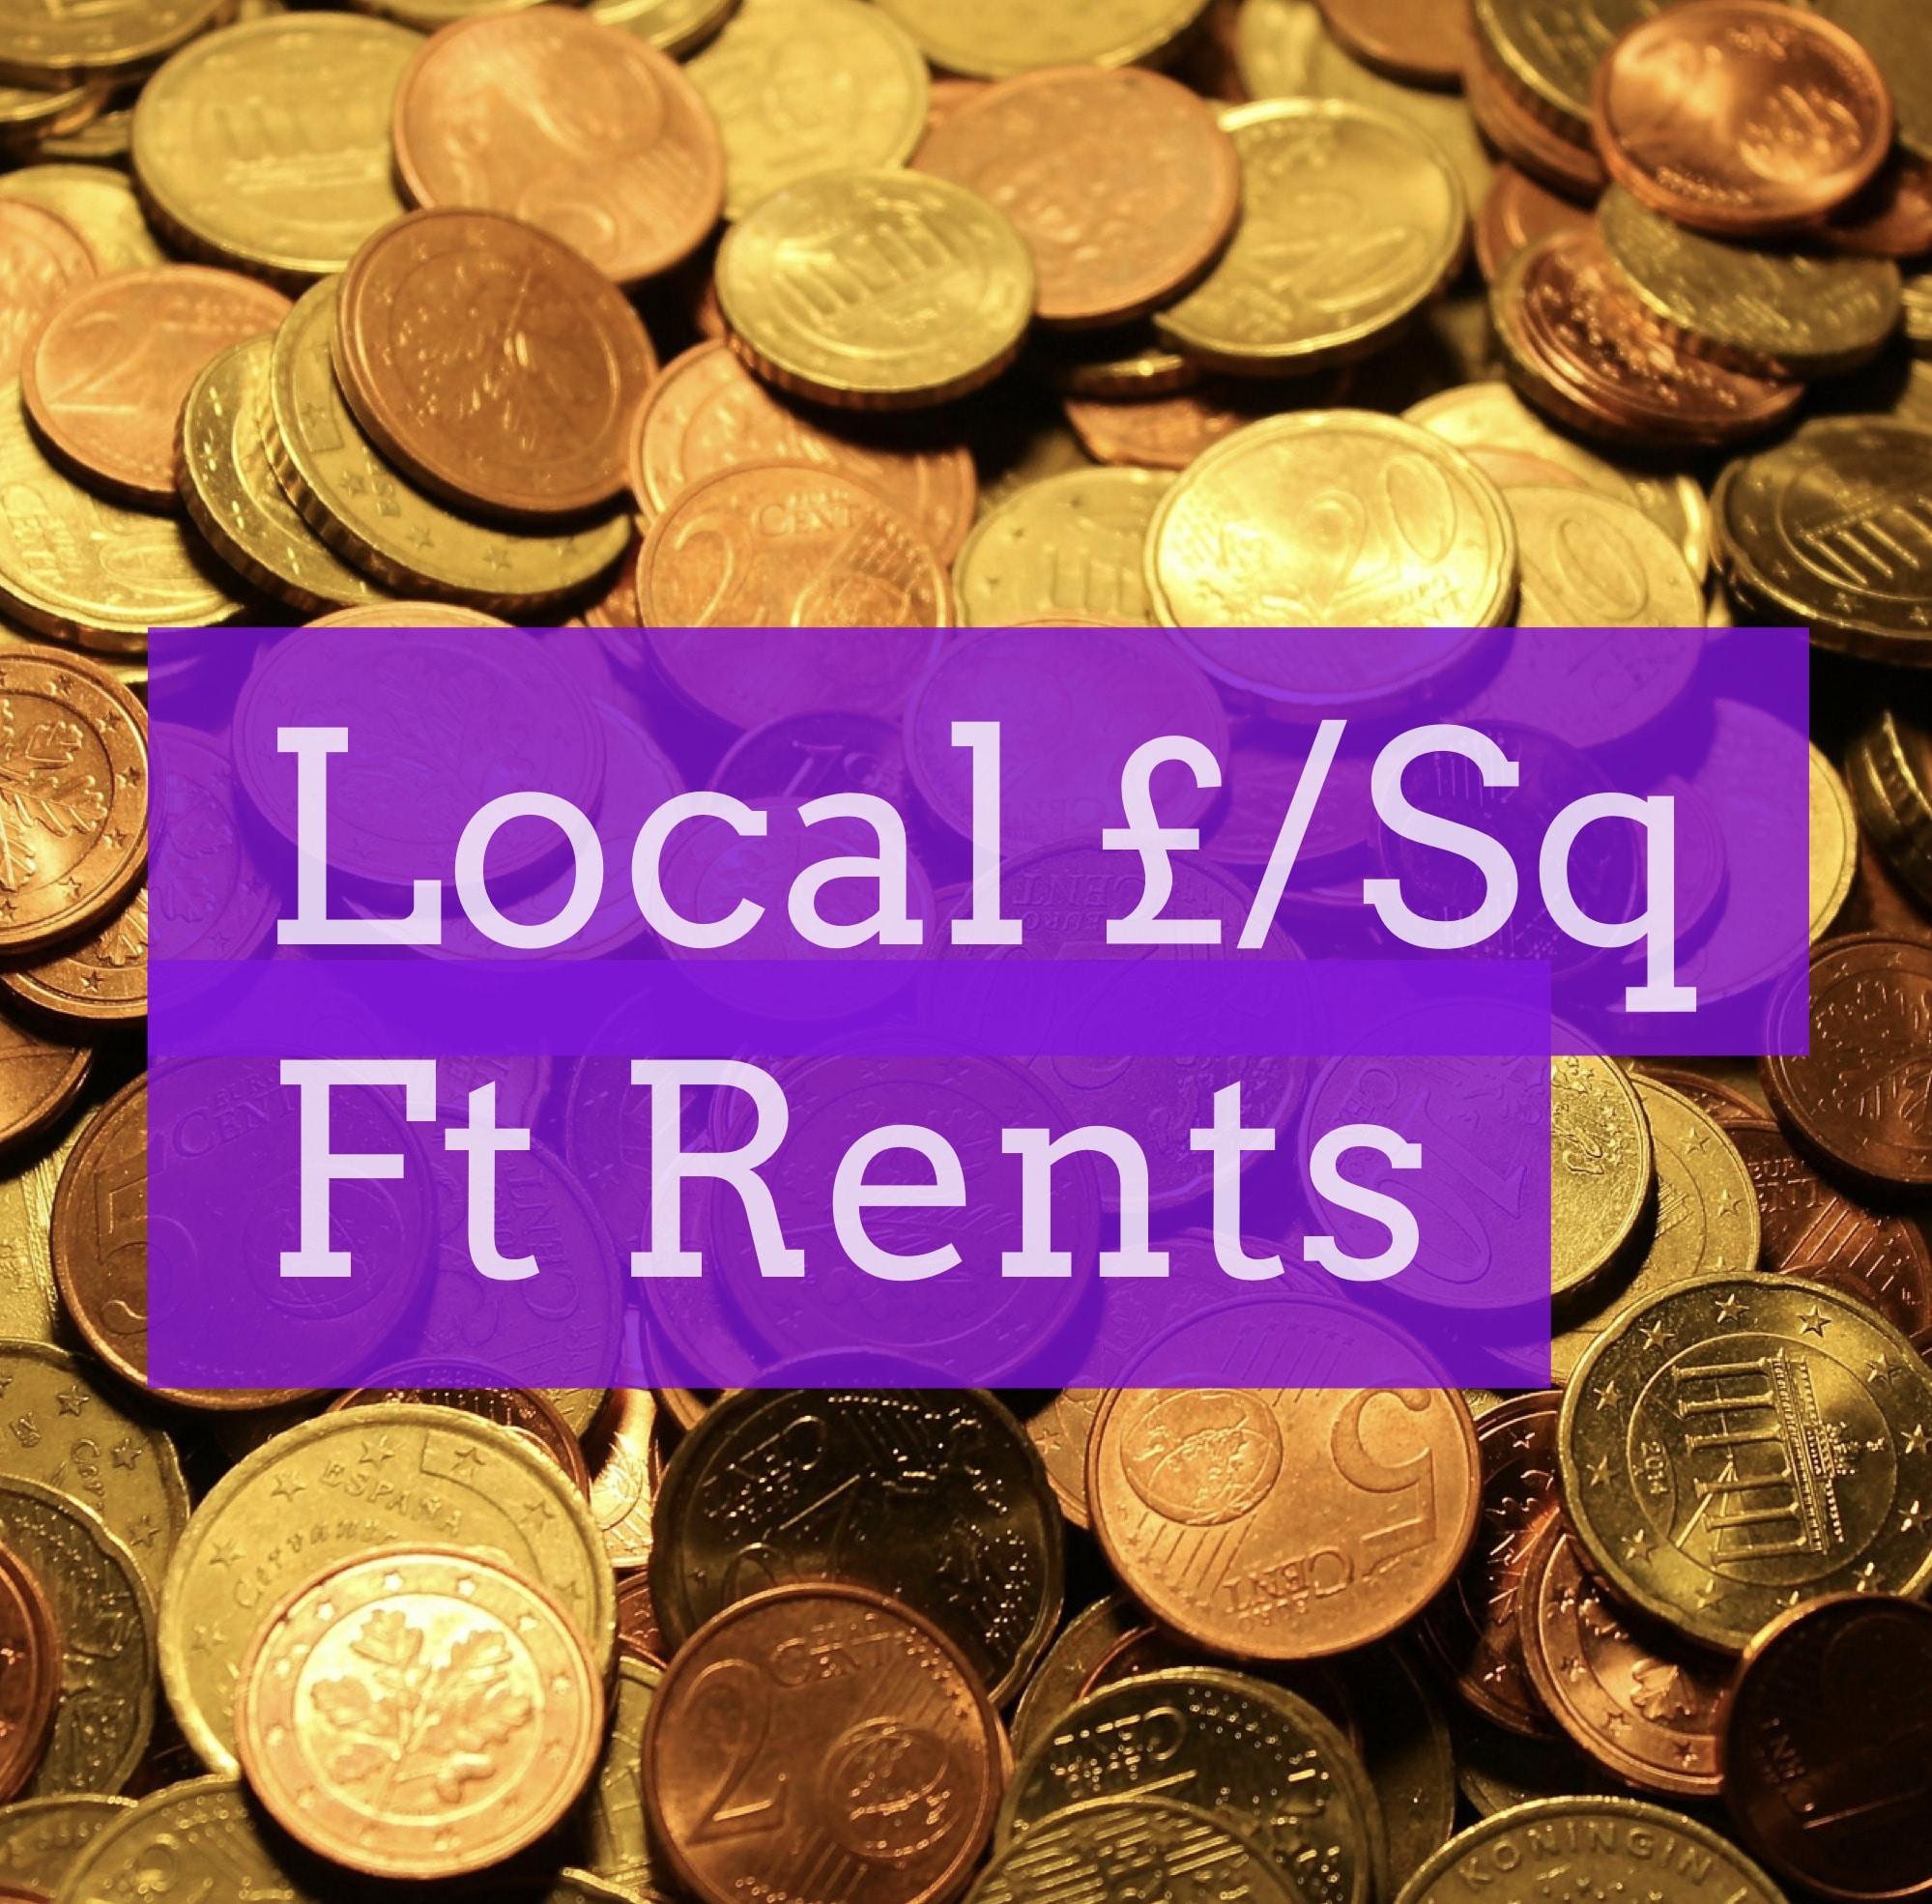 Canterbury Private Rents hit £20.14 per sq. foot